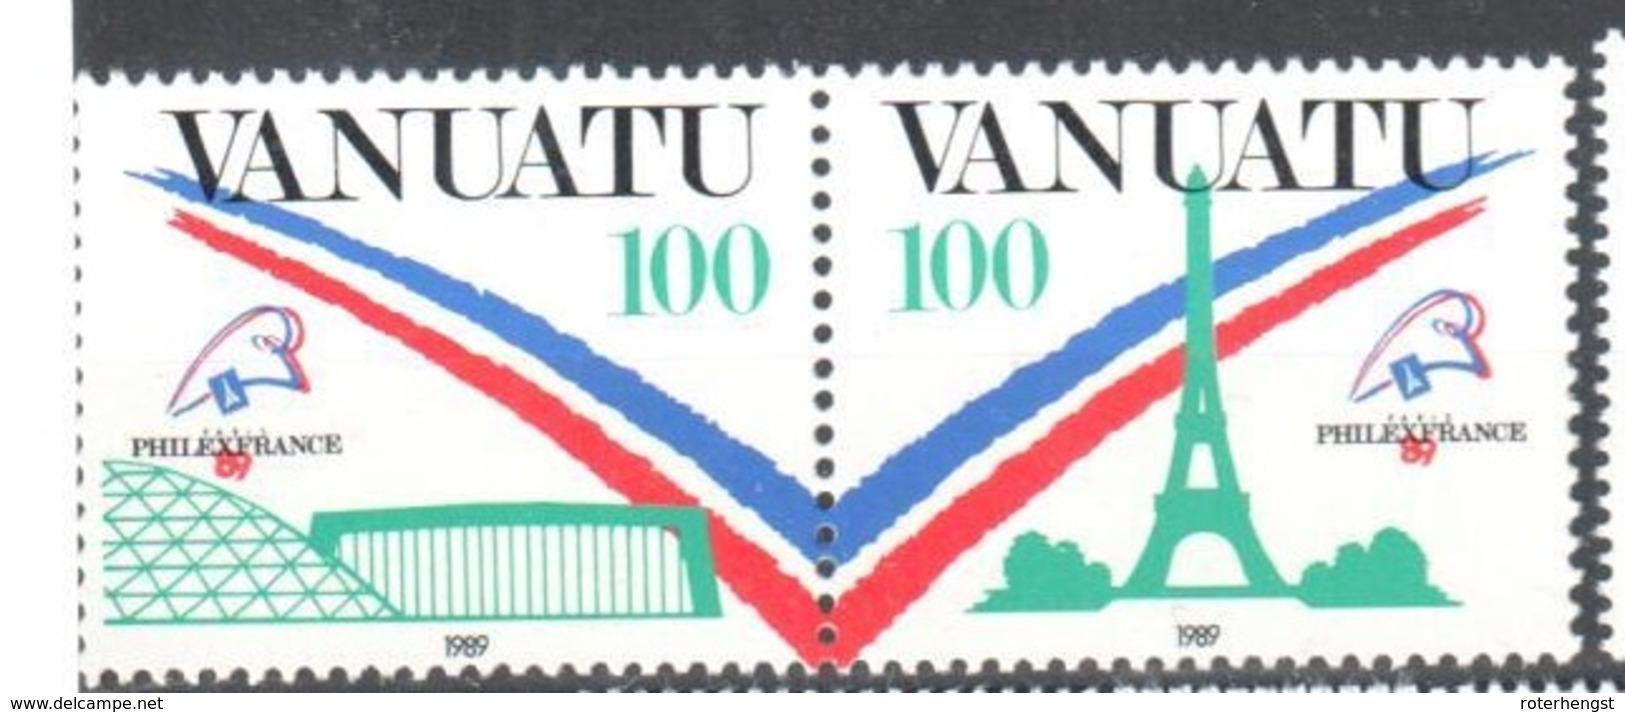 Vanuatu Pair Mnh ** Cat 3,2 Euros 1989 Eiffel Philexfrance - Vanuatu (1980-...)